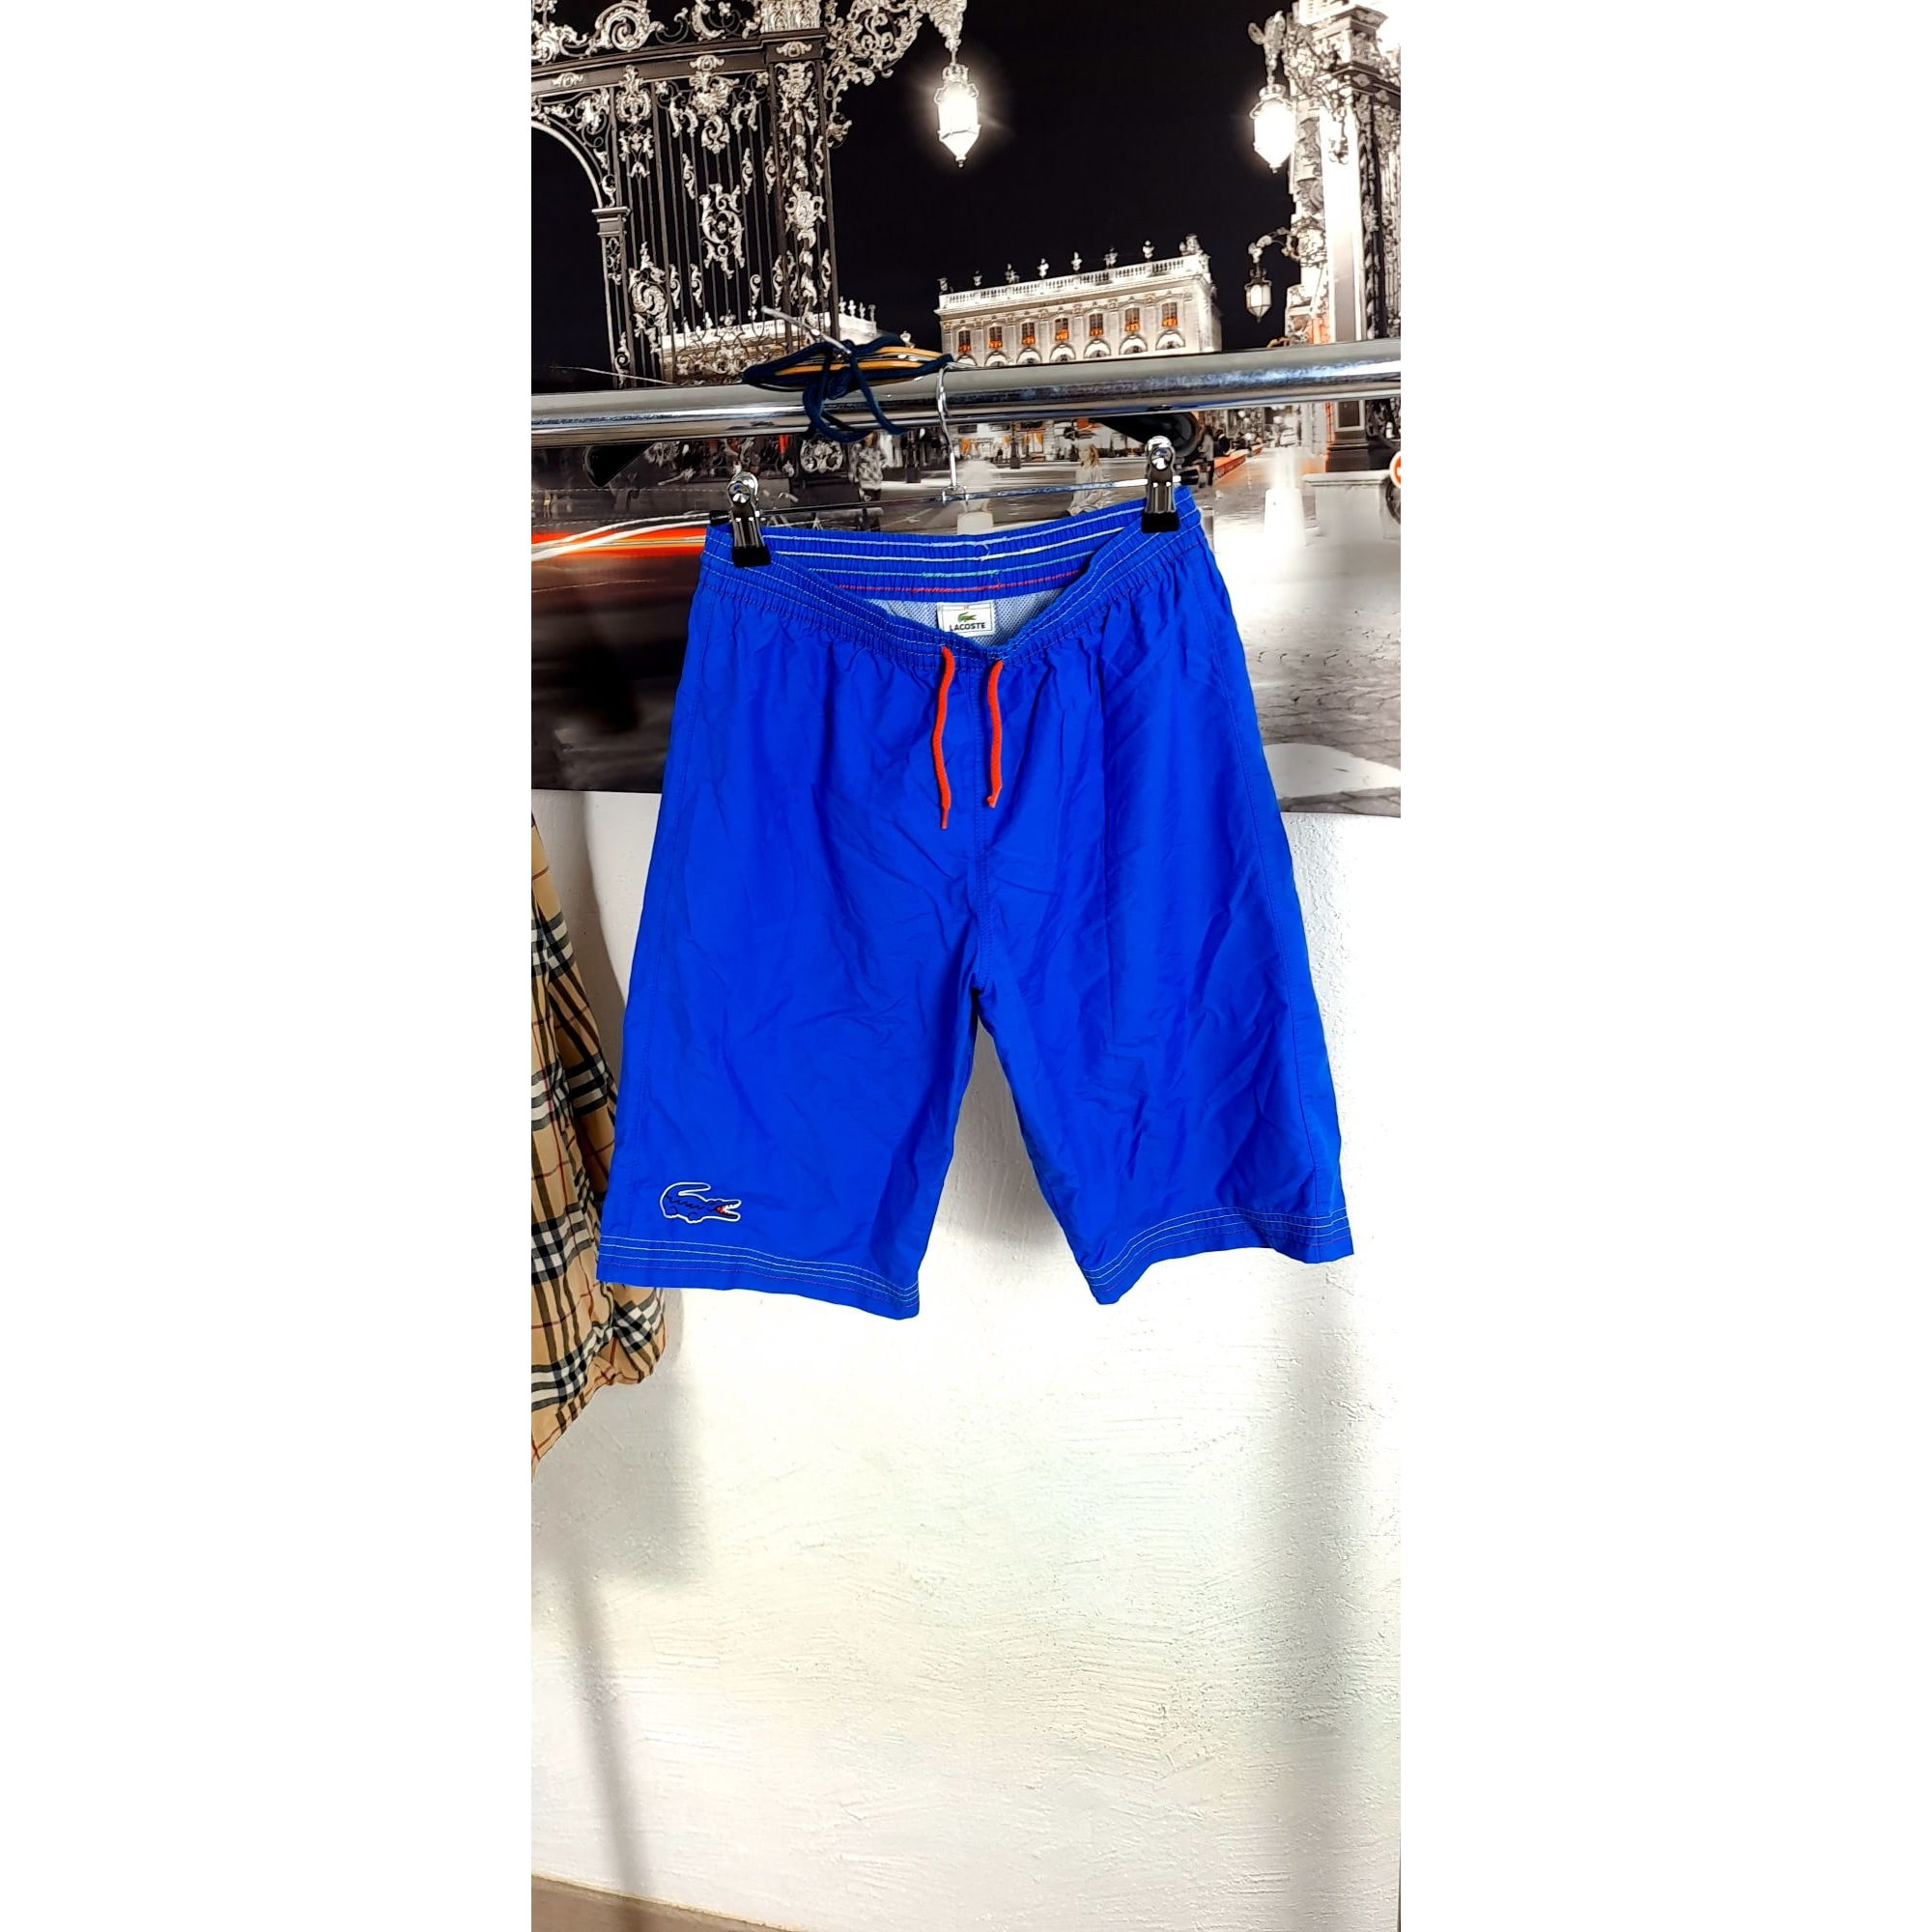 Short LACOSTE Bleu, bleu marine, bleu turquoise